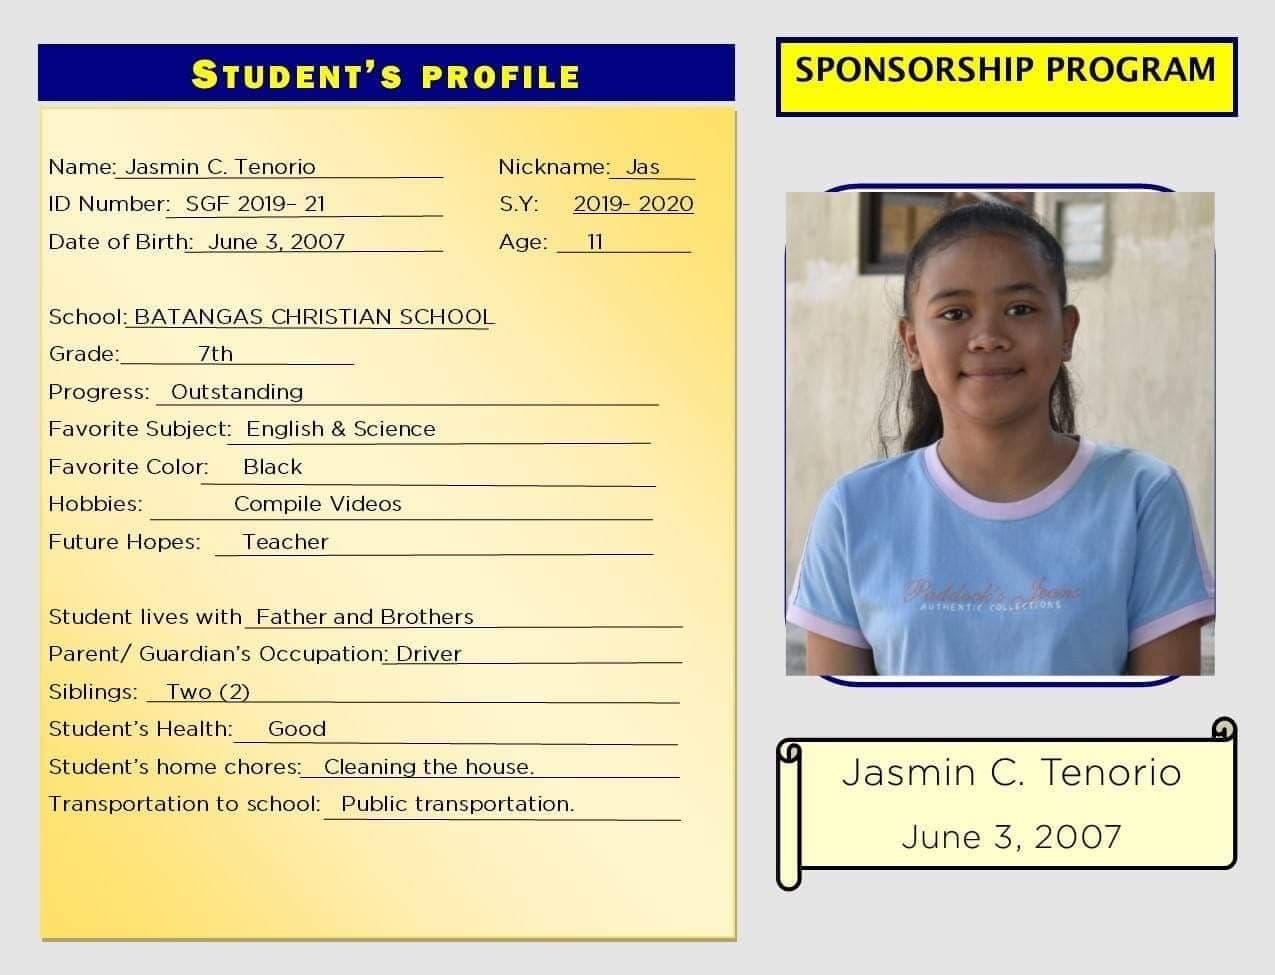 student_profile.jpg